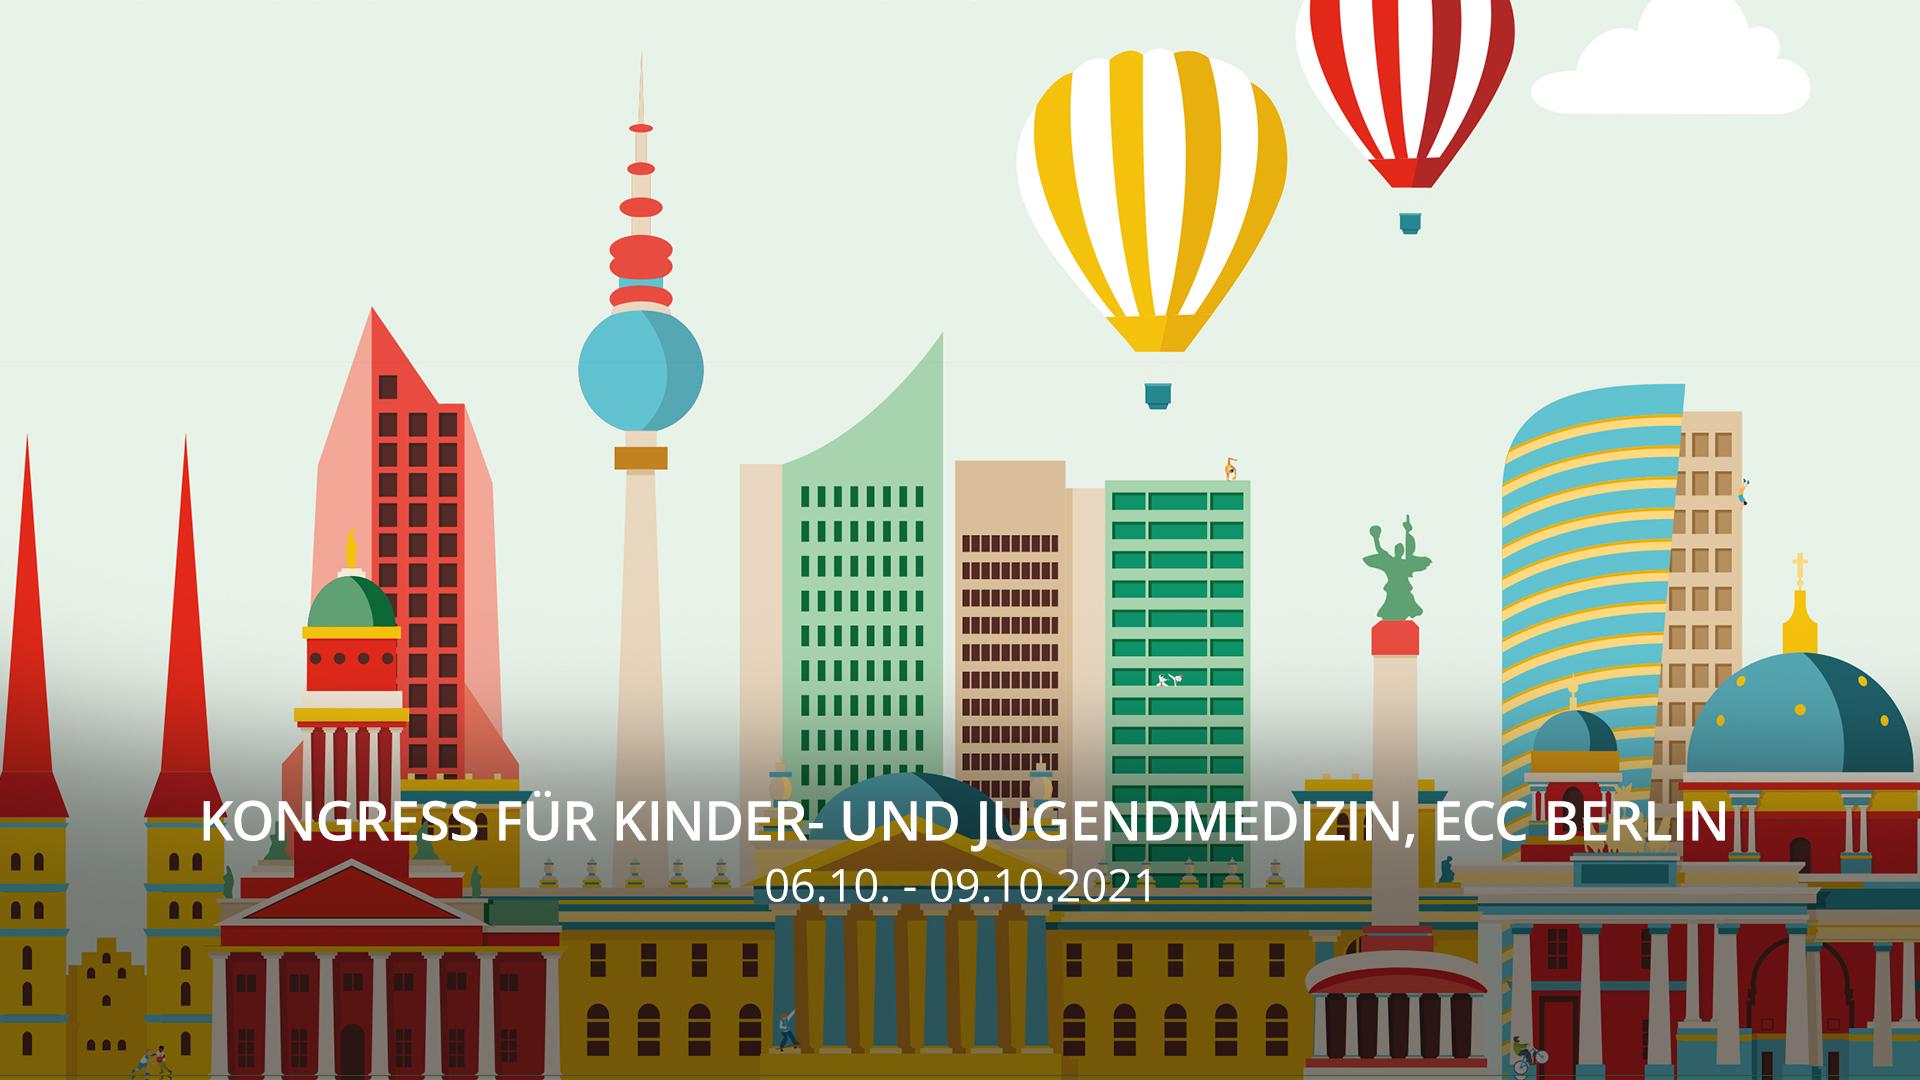 Oktober21 - Kongress für Kinder- und Jugendmedizin, Estrel Congress Center Berlin